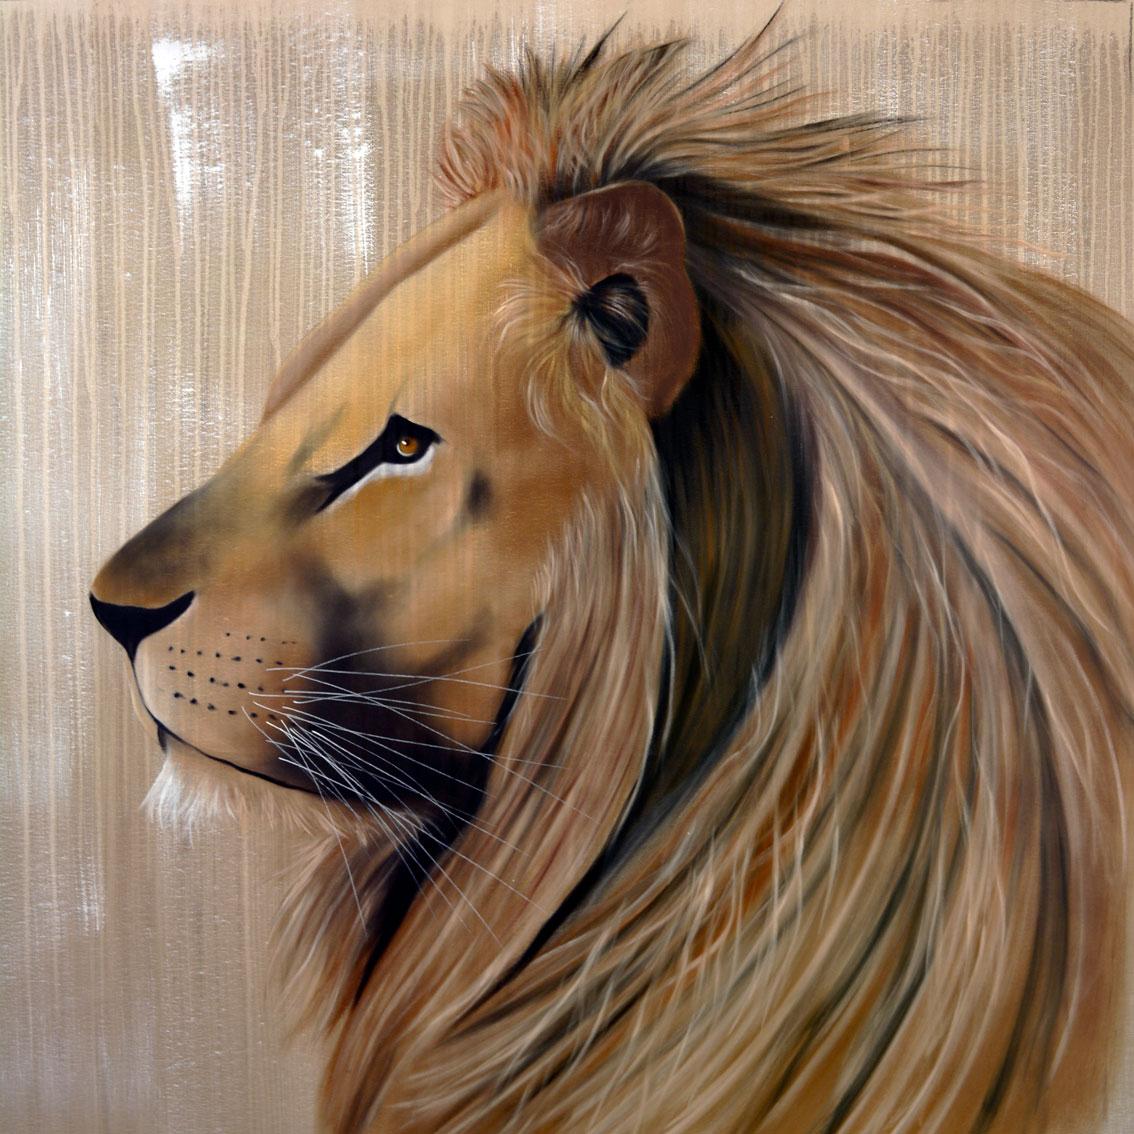 Peinture animali re de style r aliste pictures to pin on for Style de peinture